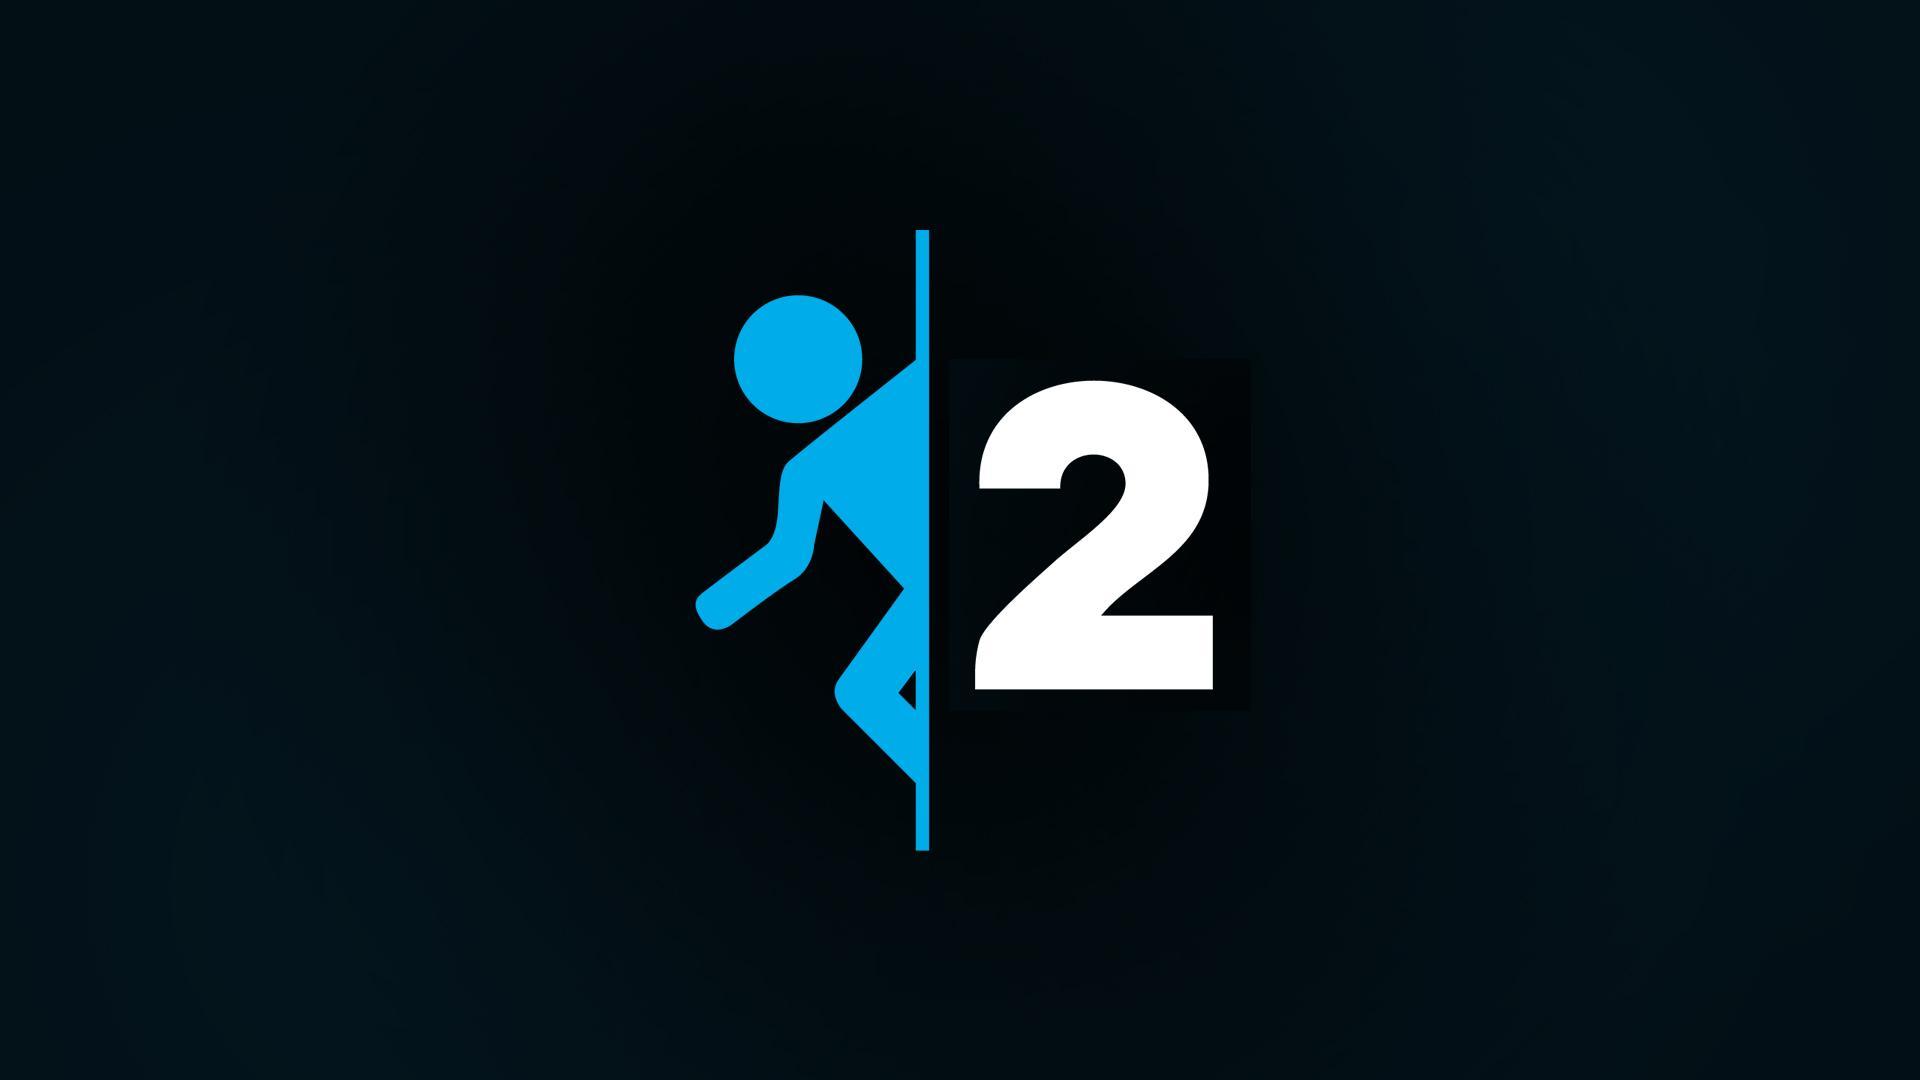 Portal 2 Logo Wallpaper